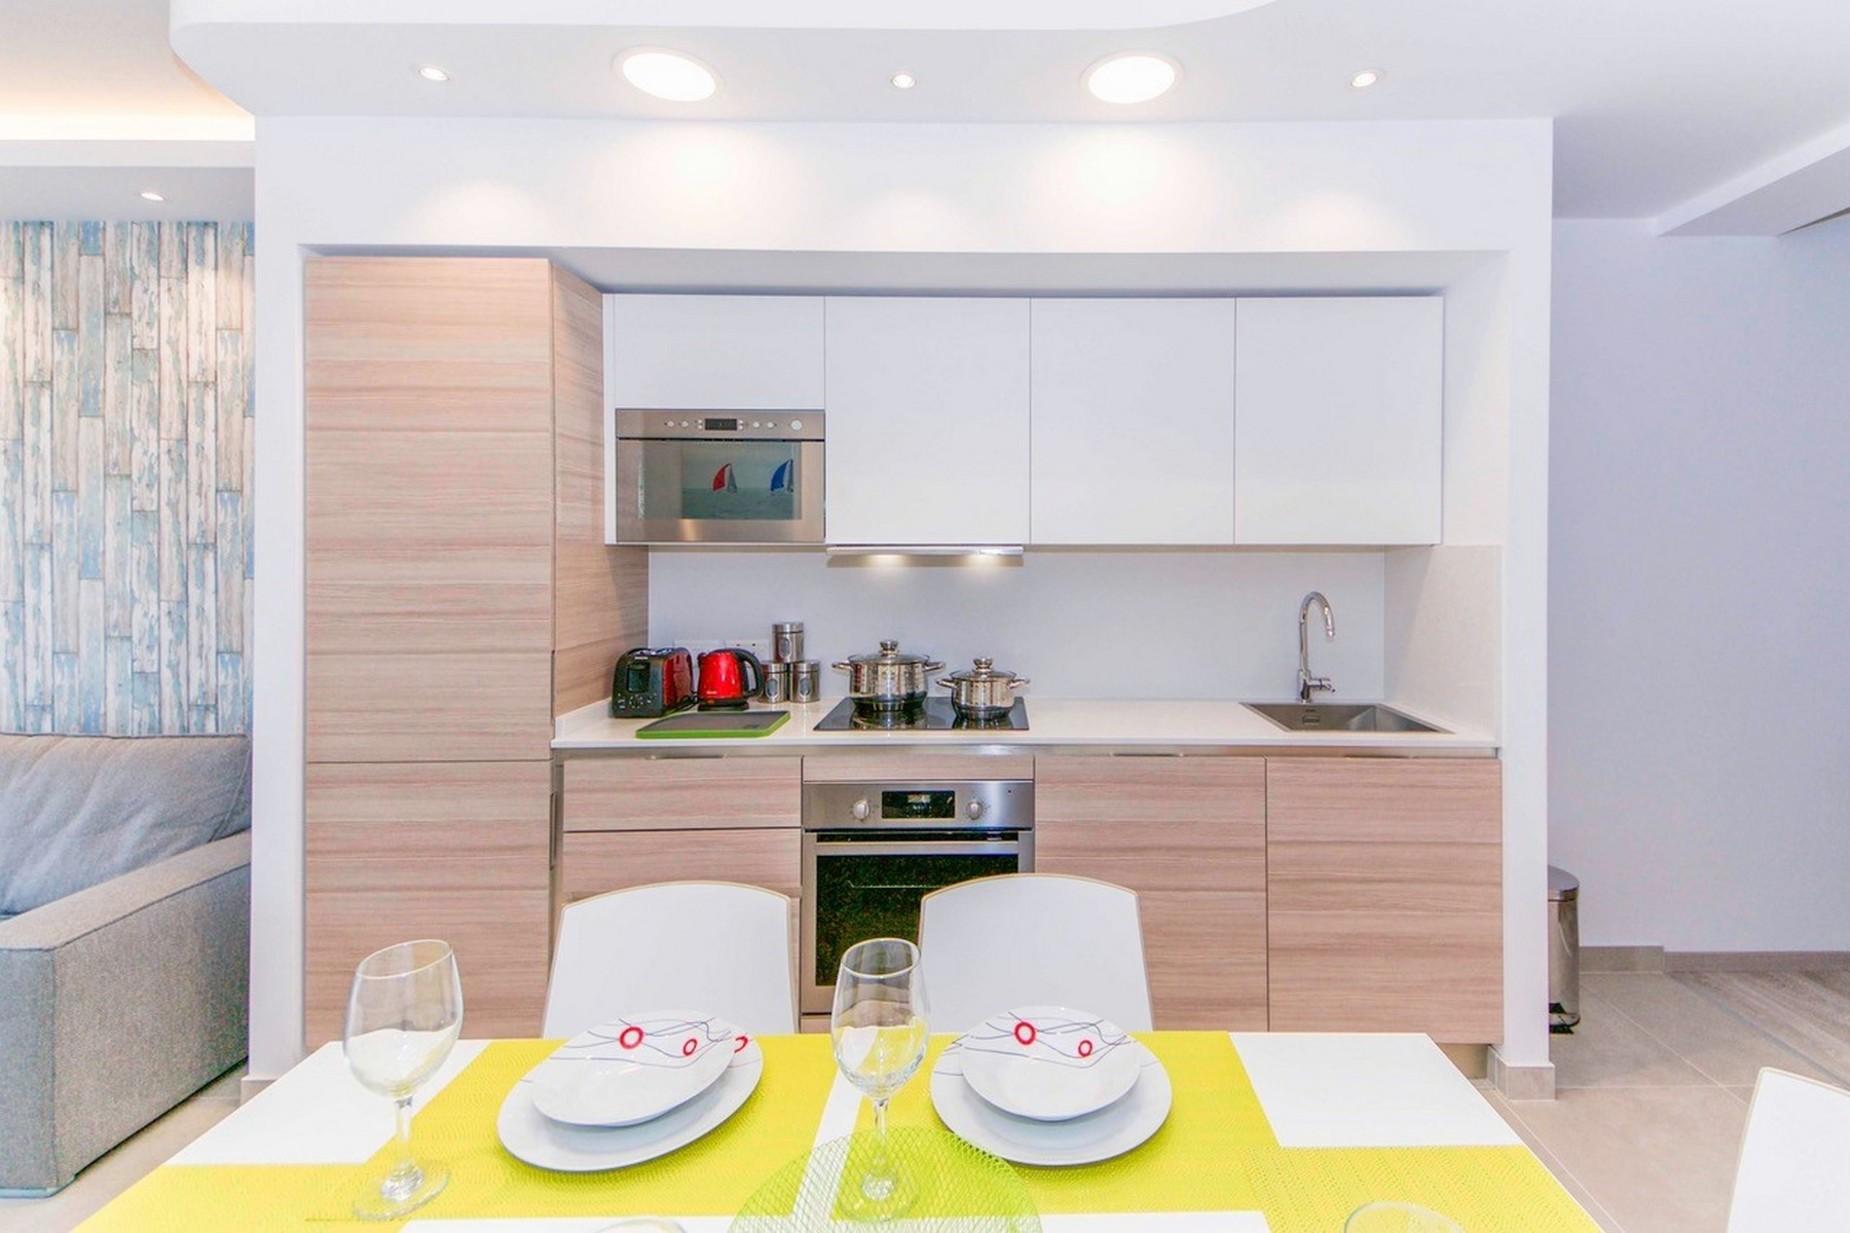 2 bed Apartment For Rent in Qawra, Qawra - thumb 8